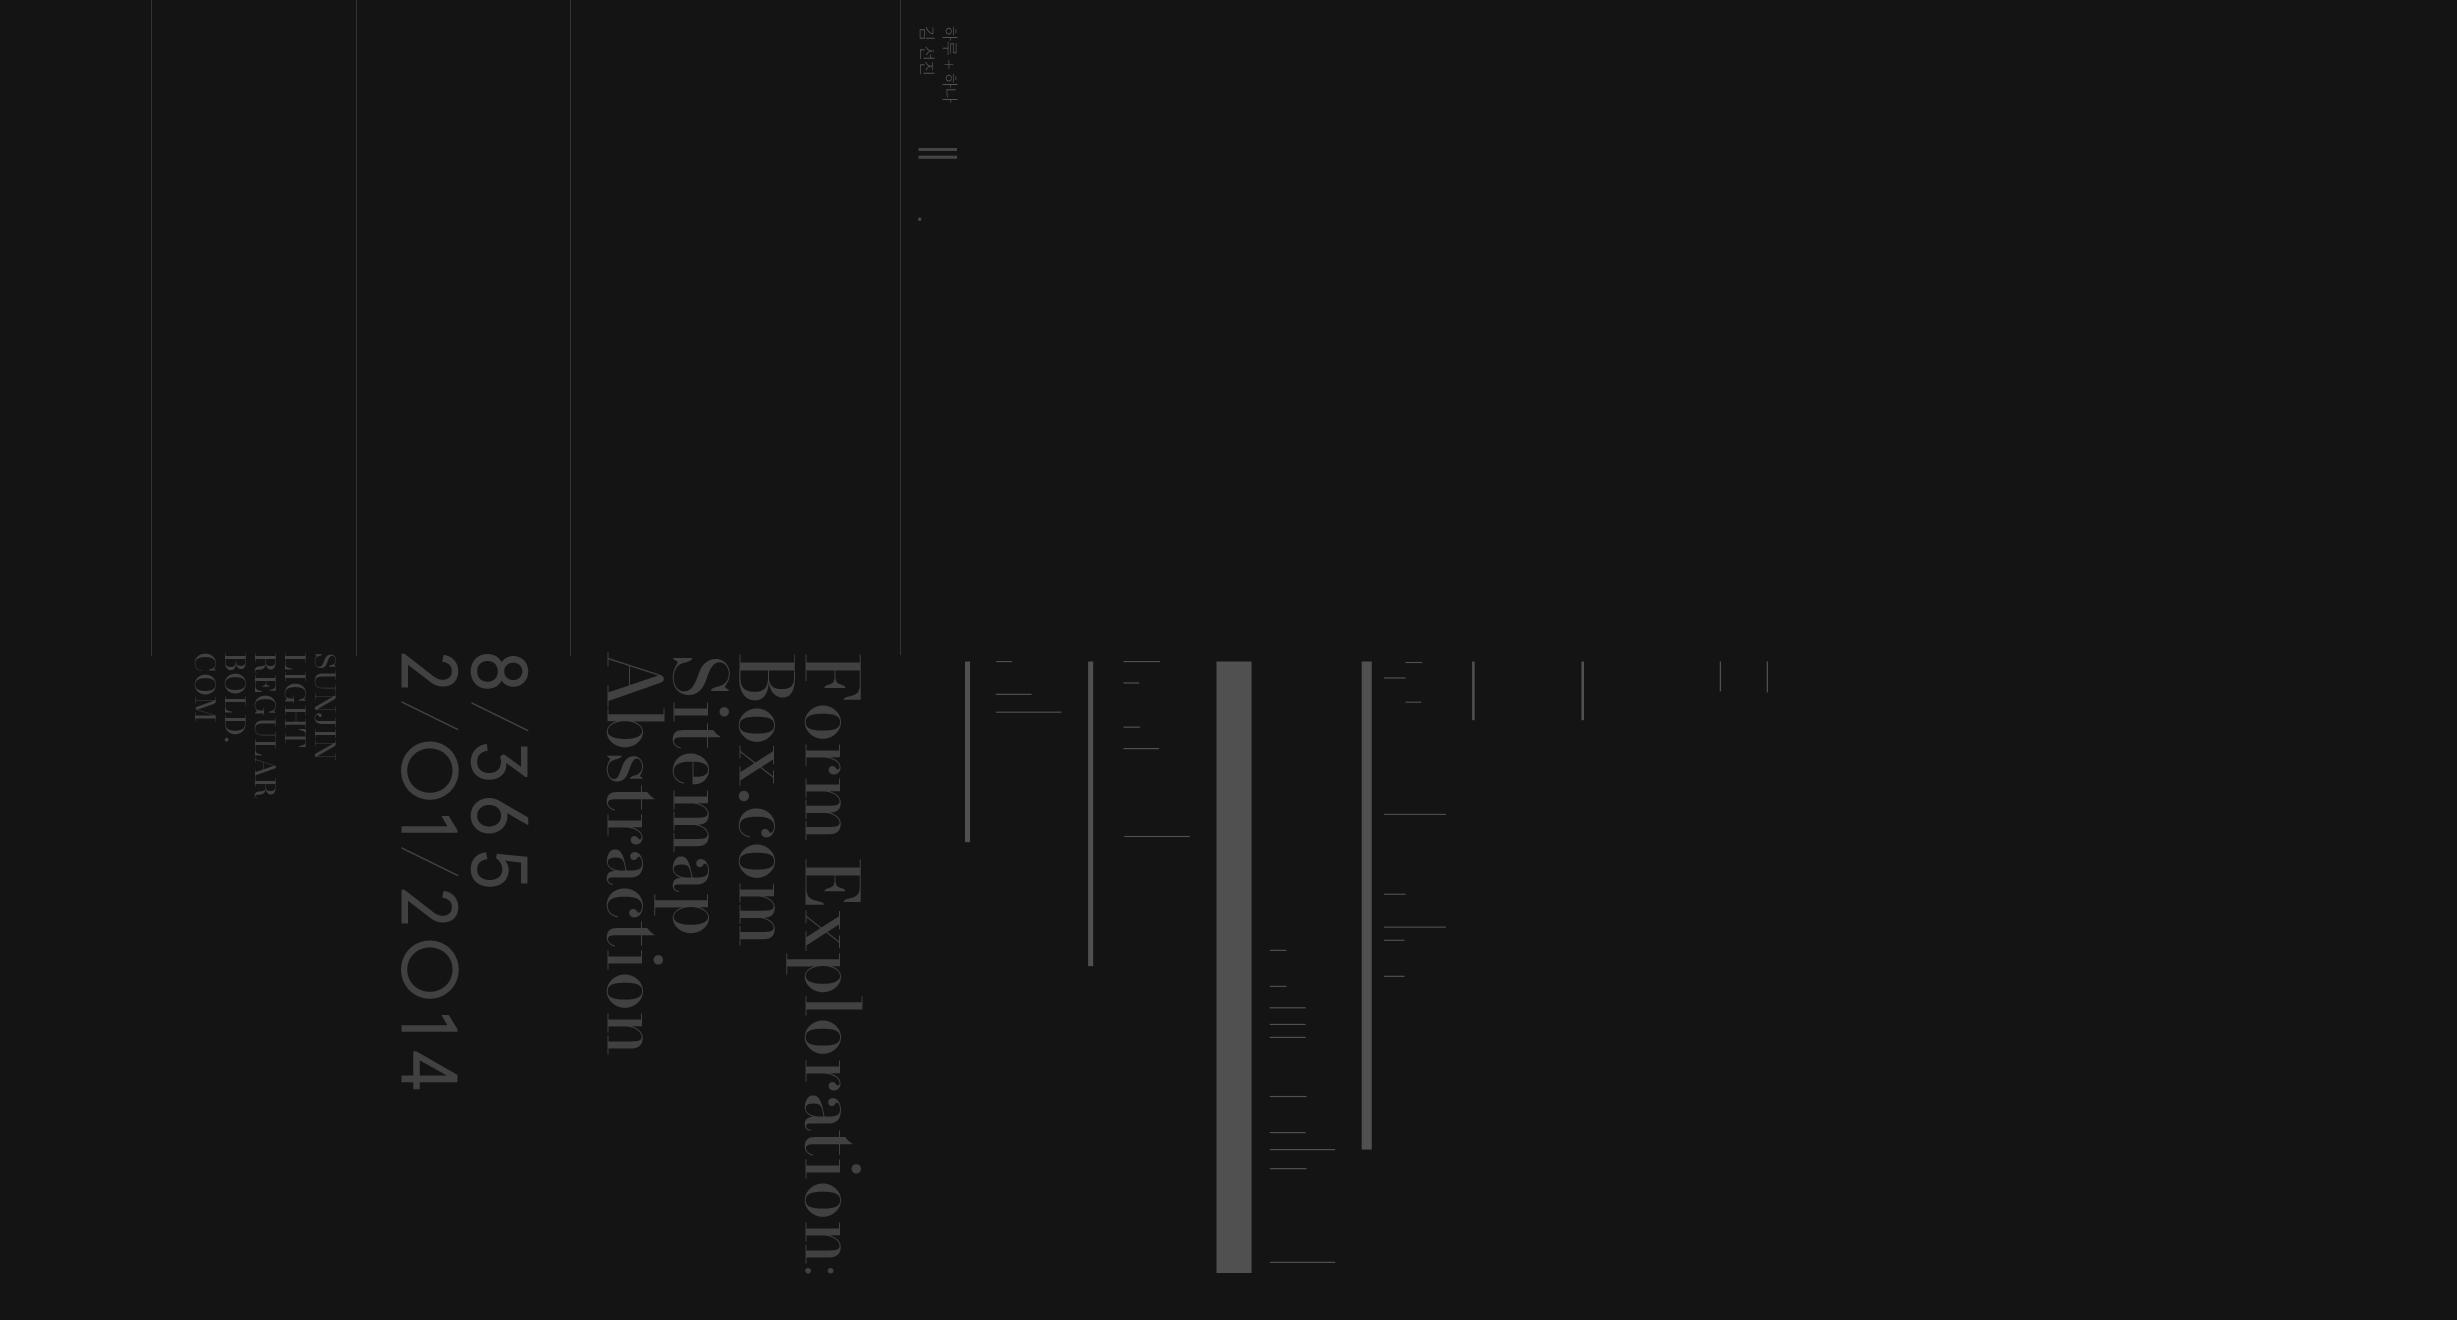 02_01B